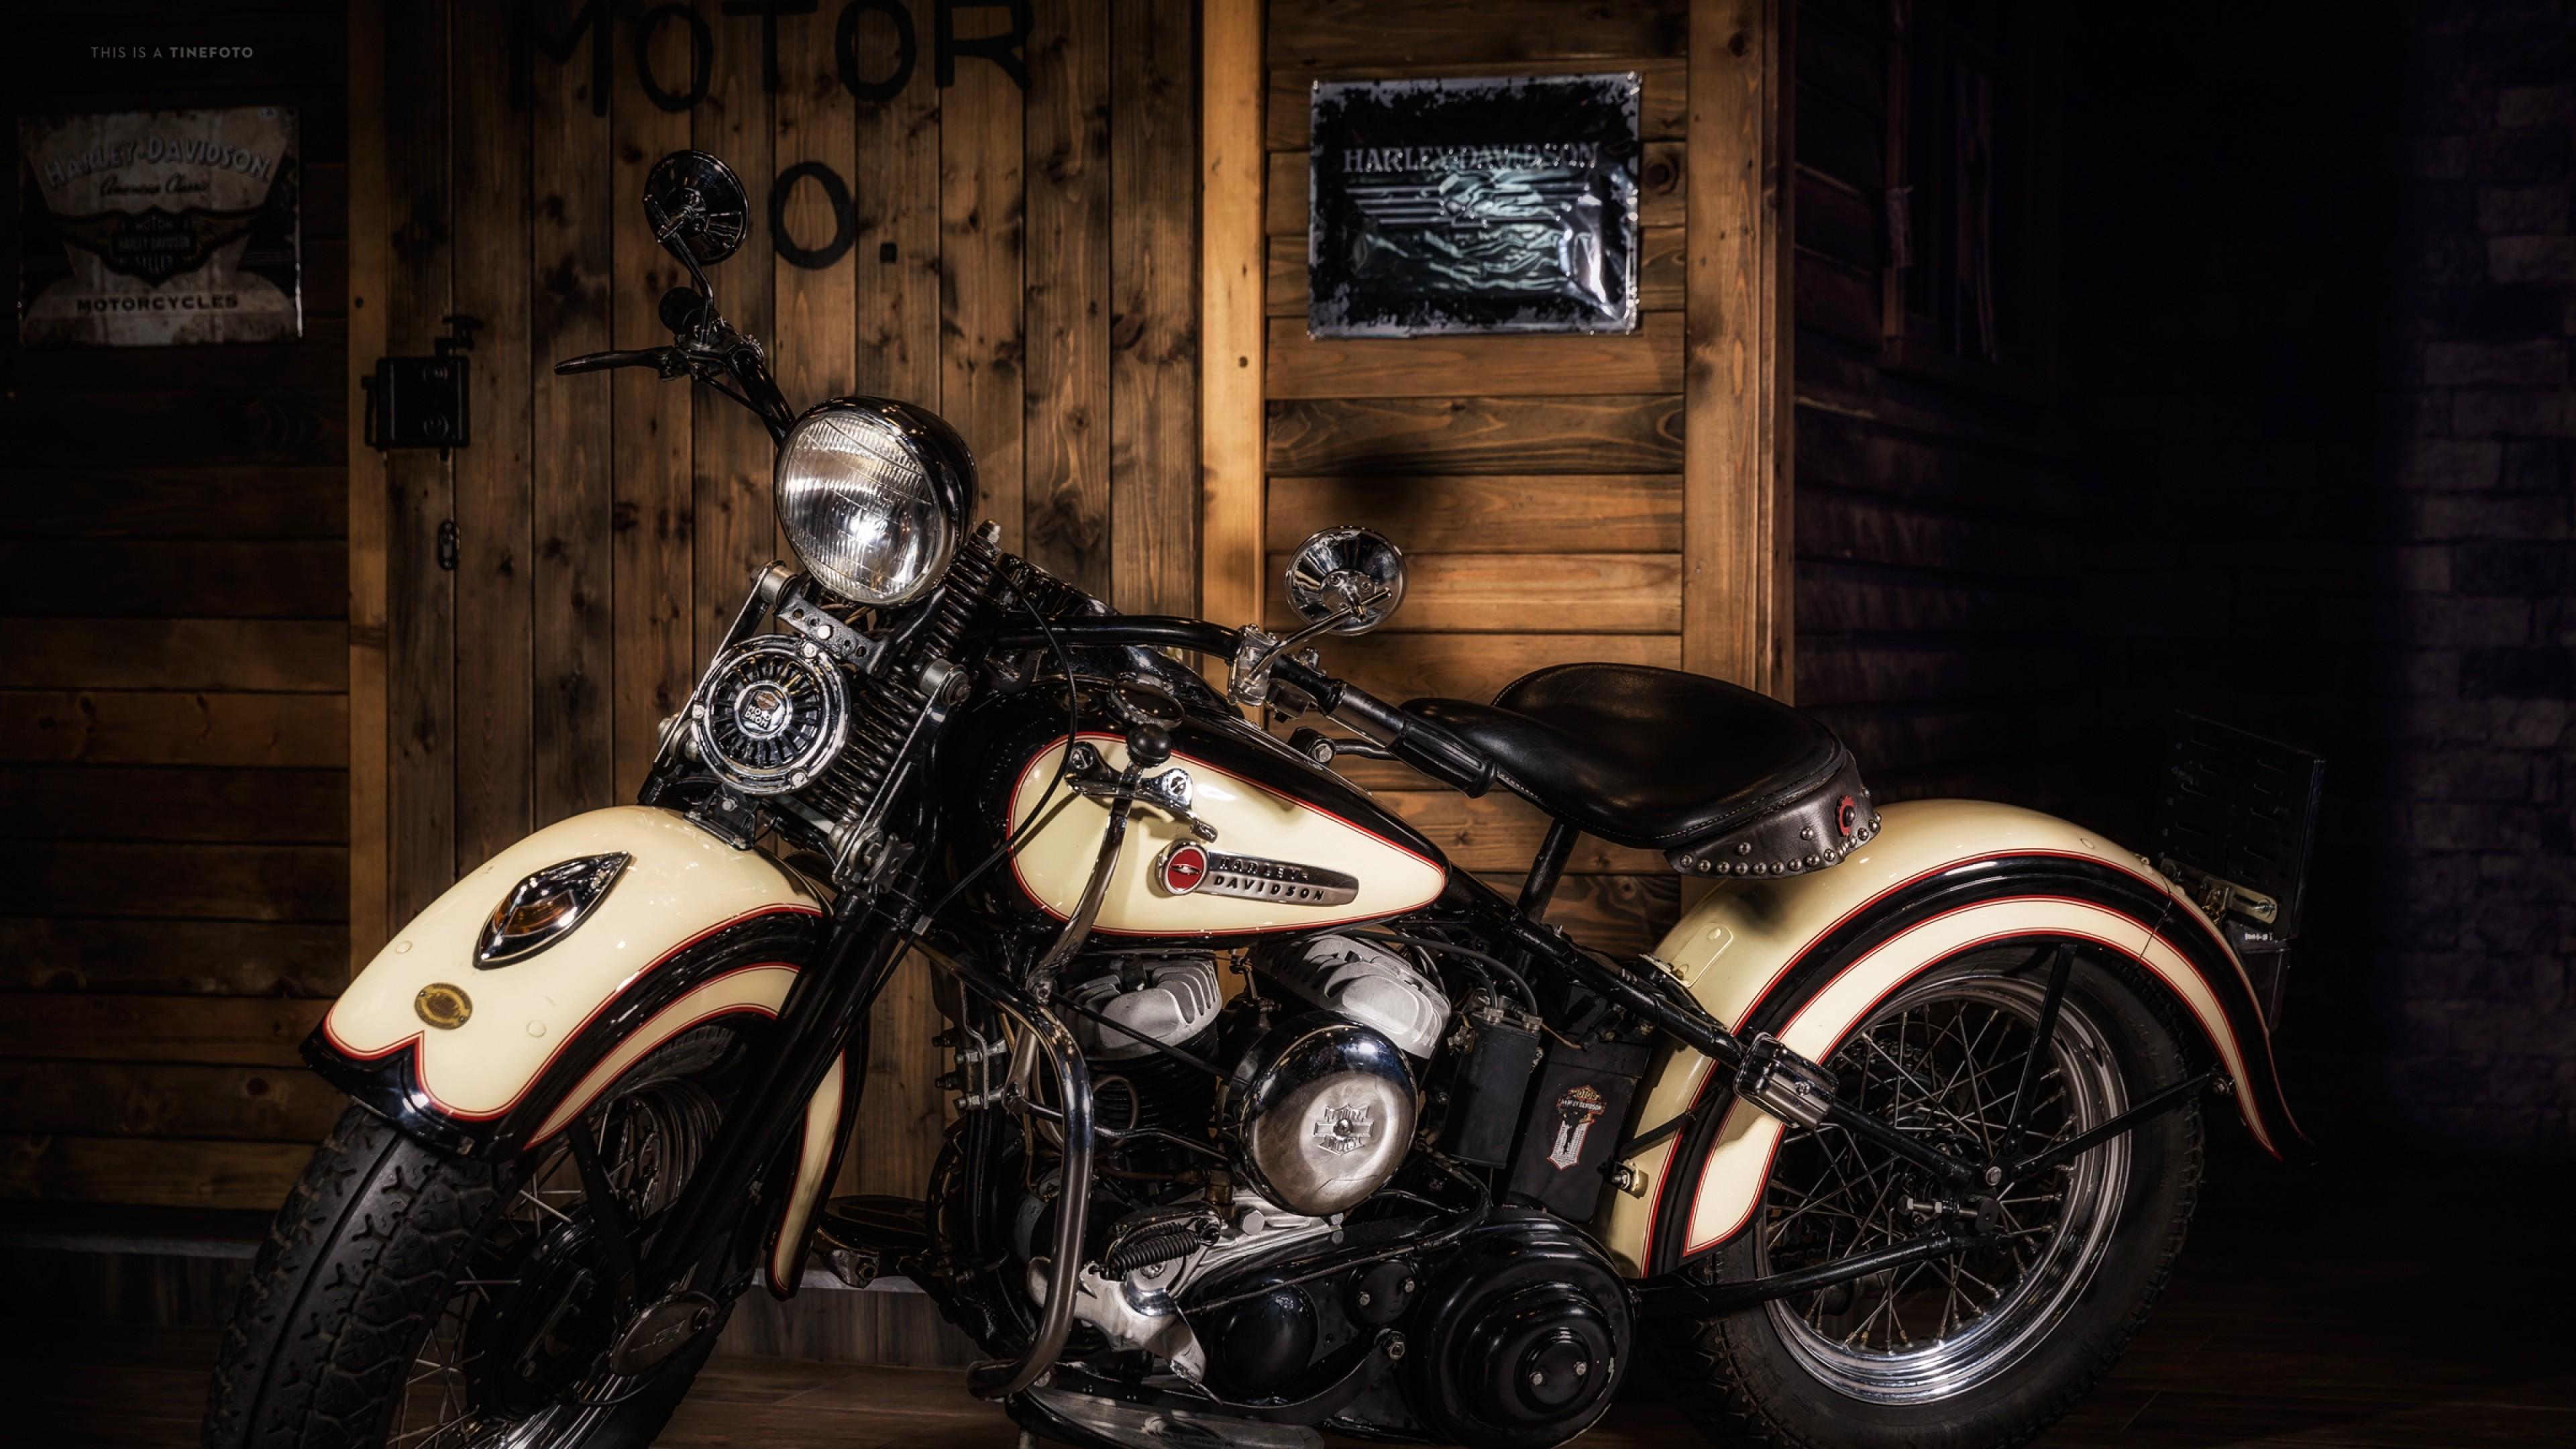 Harley Davidson Desktop Wallpapers ·① WallpaperTag